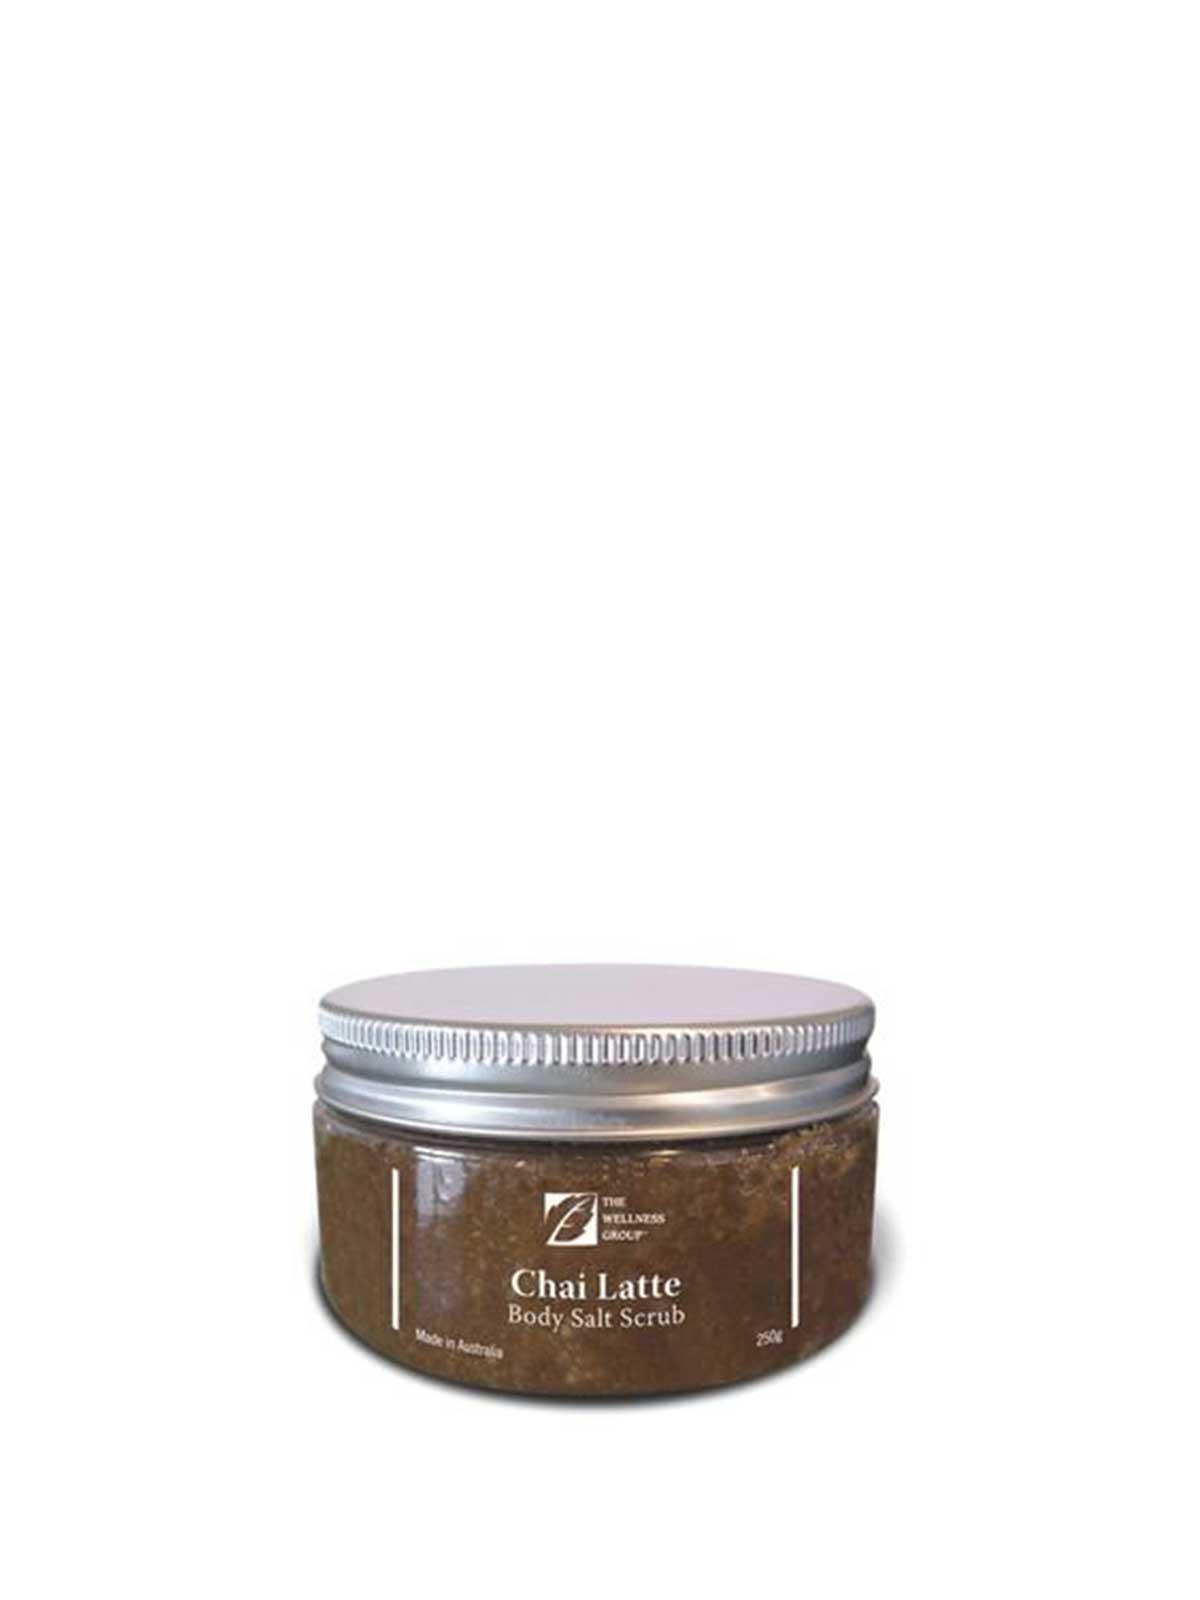 Chai Latte Salt Scrub